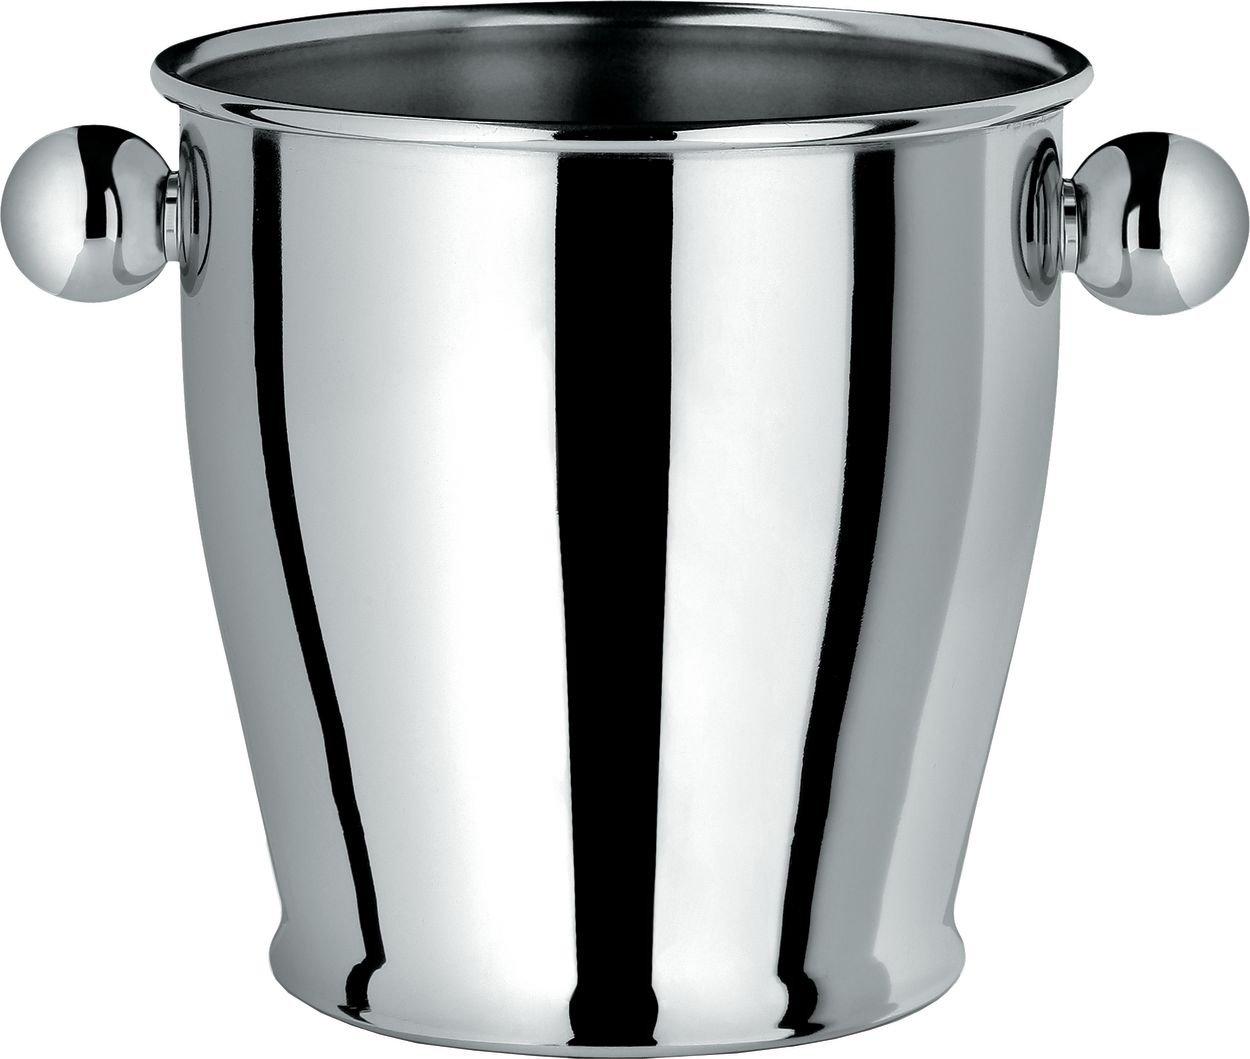 Alessi CA71 Decorative Ice Bucket, Silver